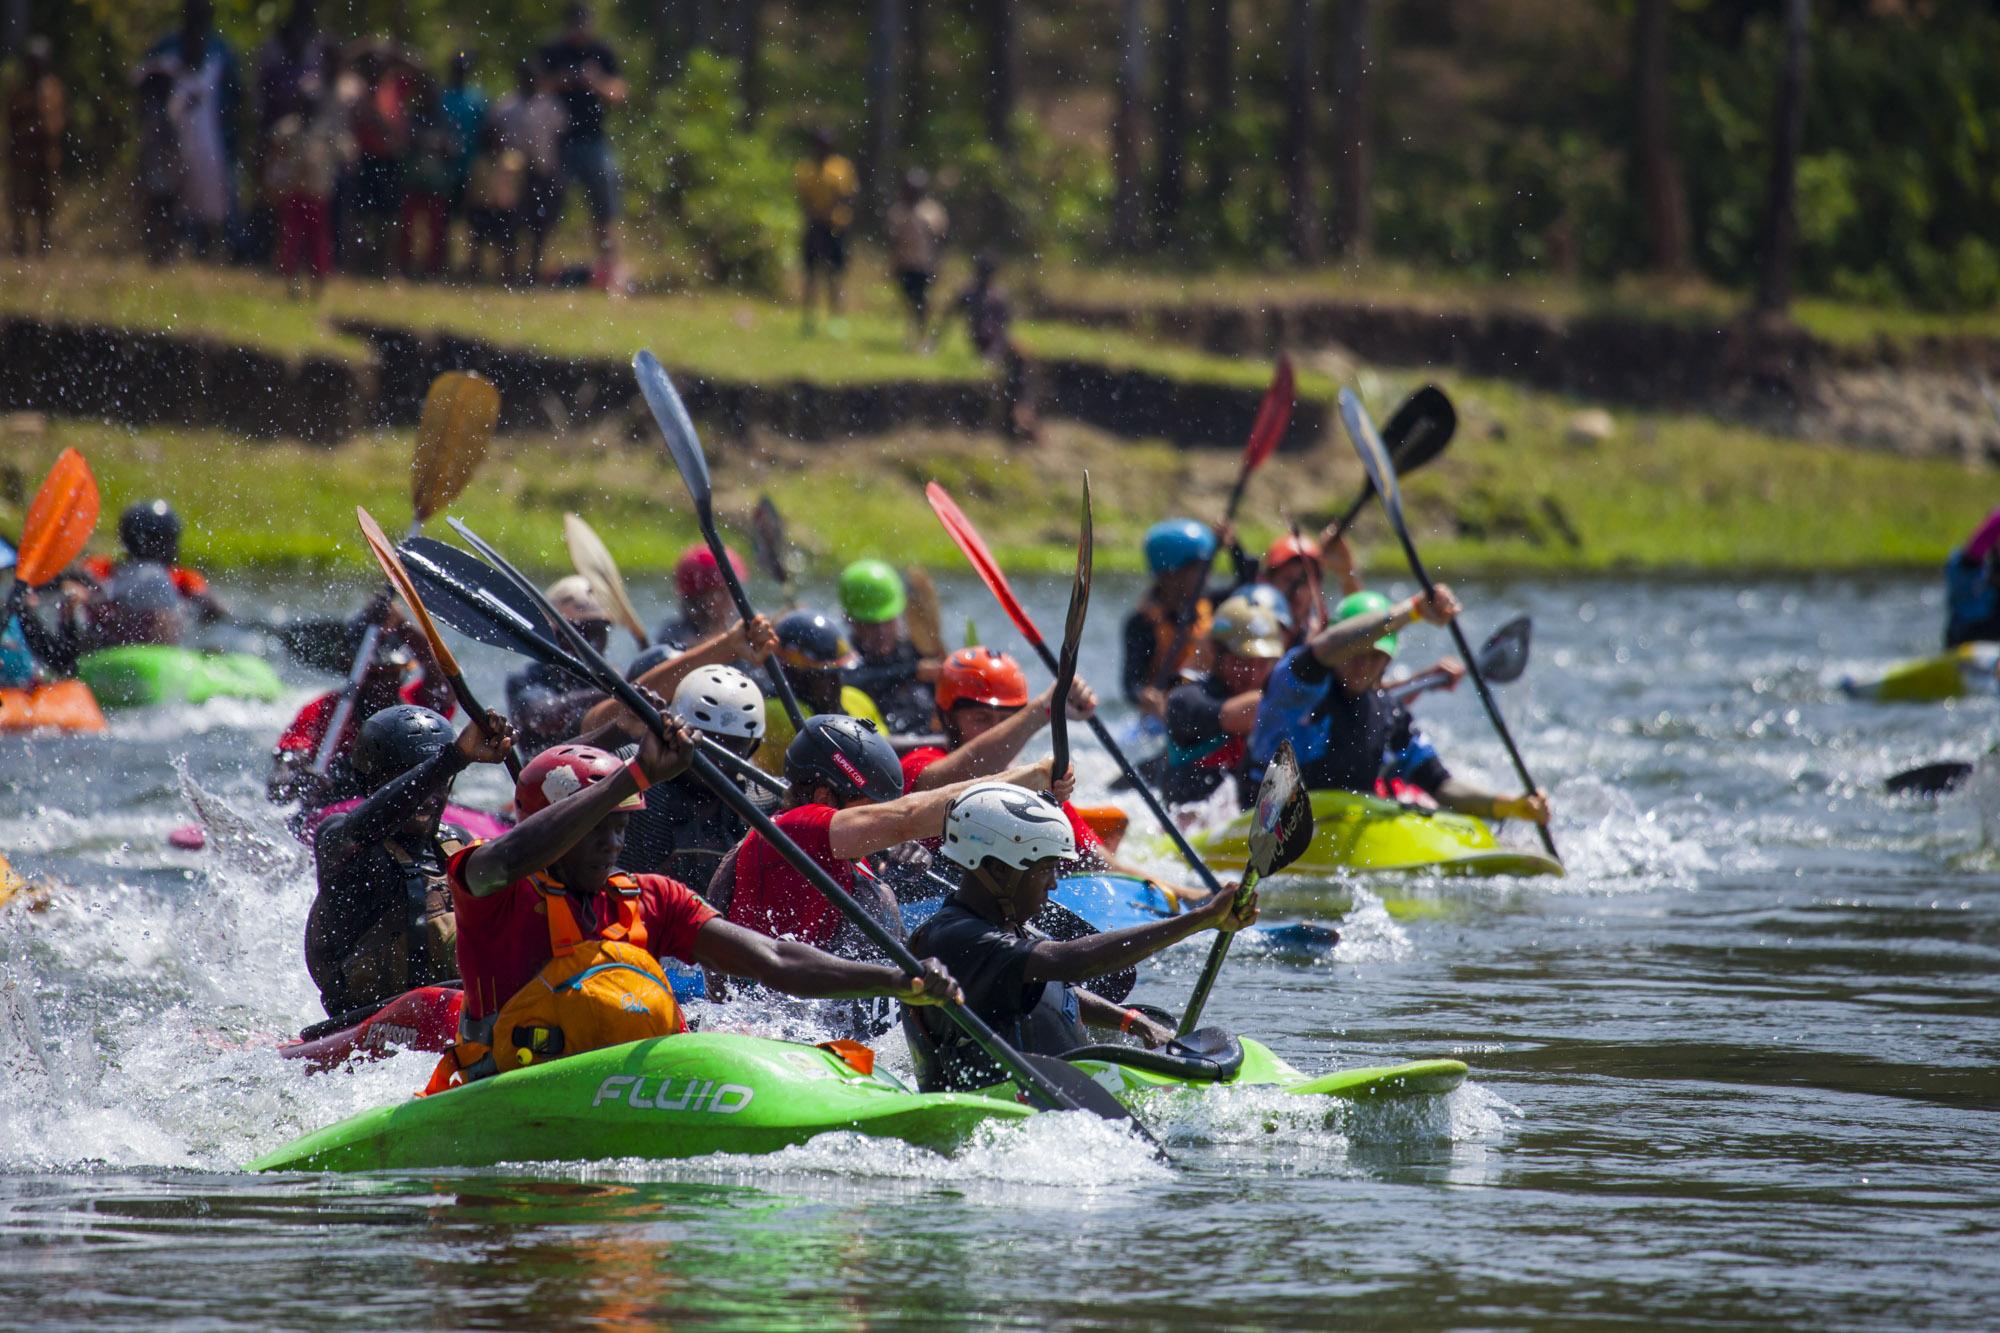 Endurance_Race_Silverback_dam_Photographer Haley_Mckee